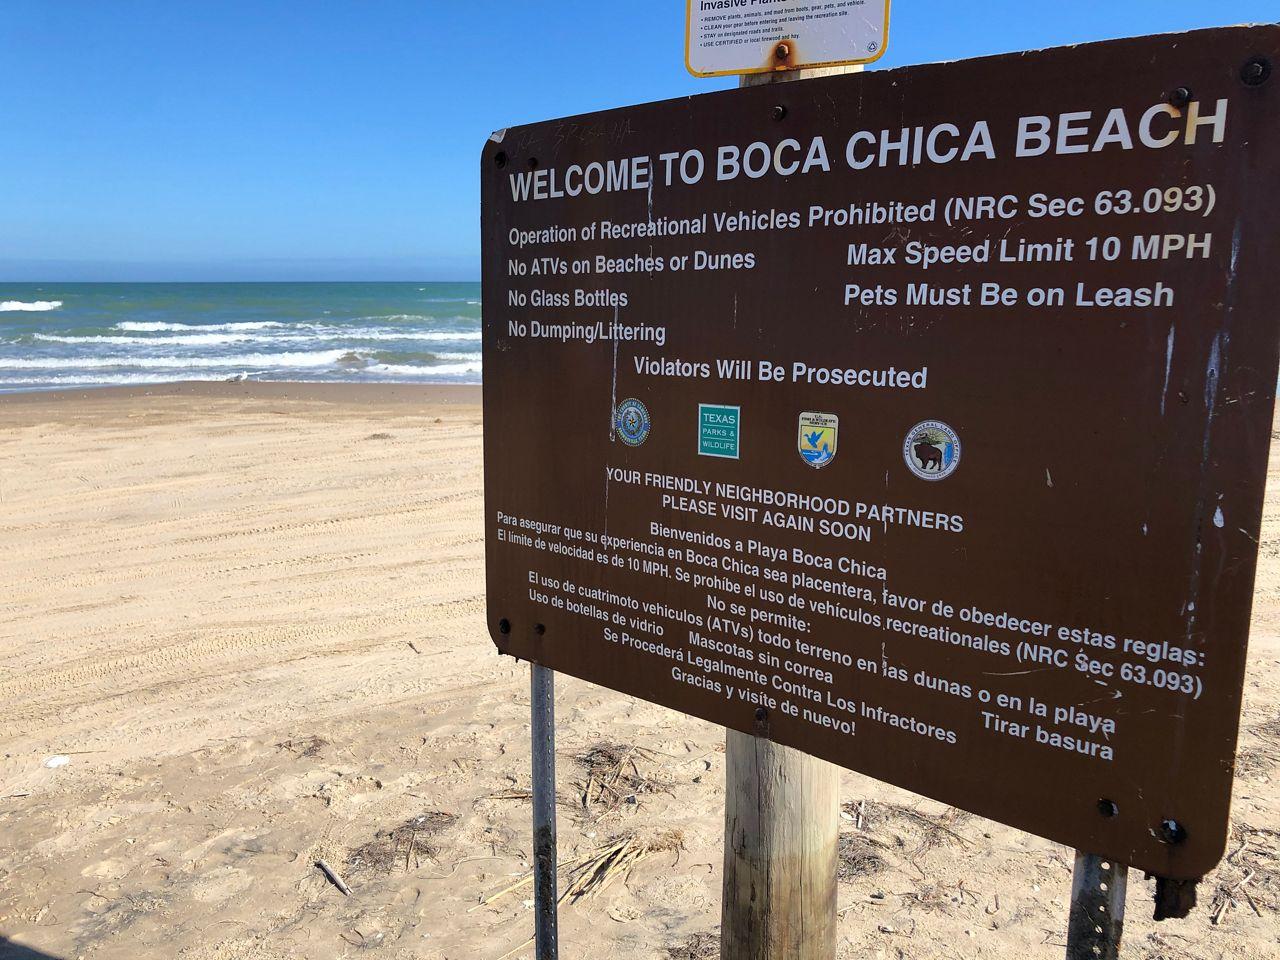 Boca Chica Village sits against the Gulf Coast and Space X's rocket test site. (John Salazar/Spectrum News 1)